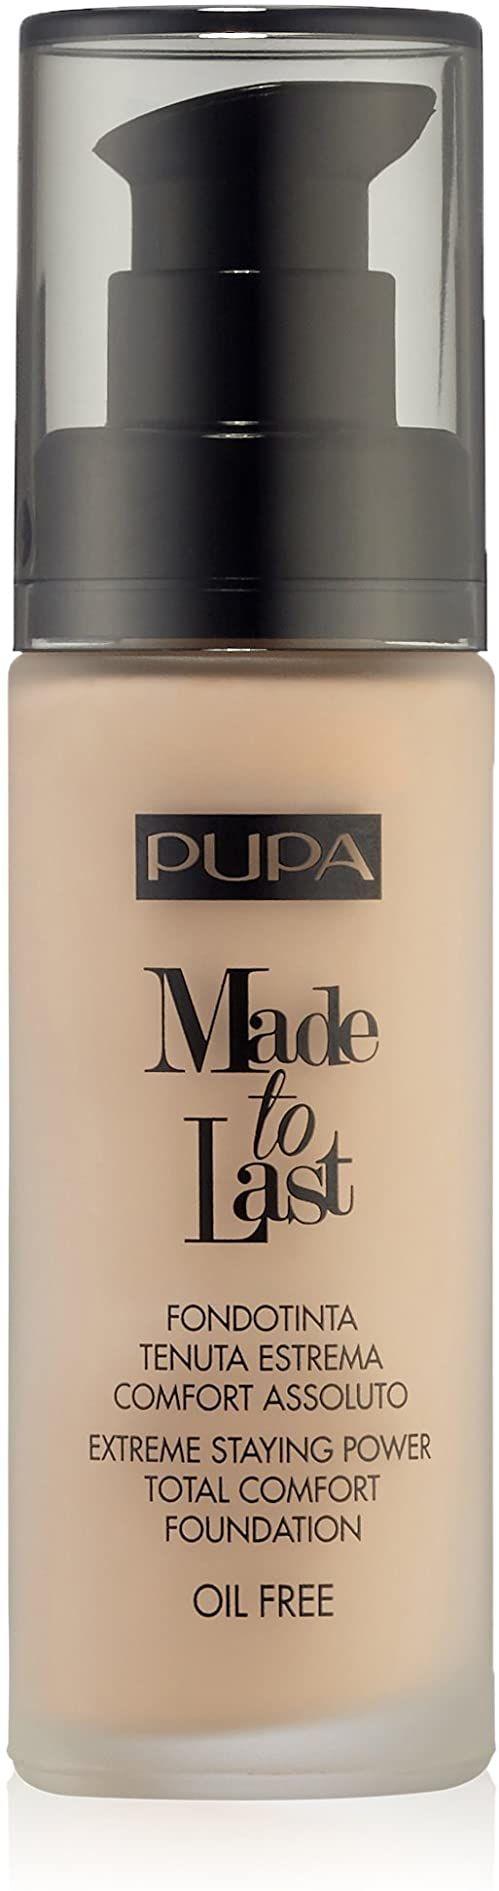 Pupa Made To Last Foundation 020 Light Beige